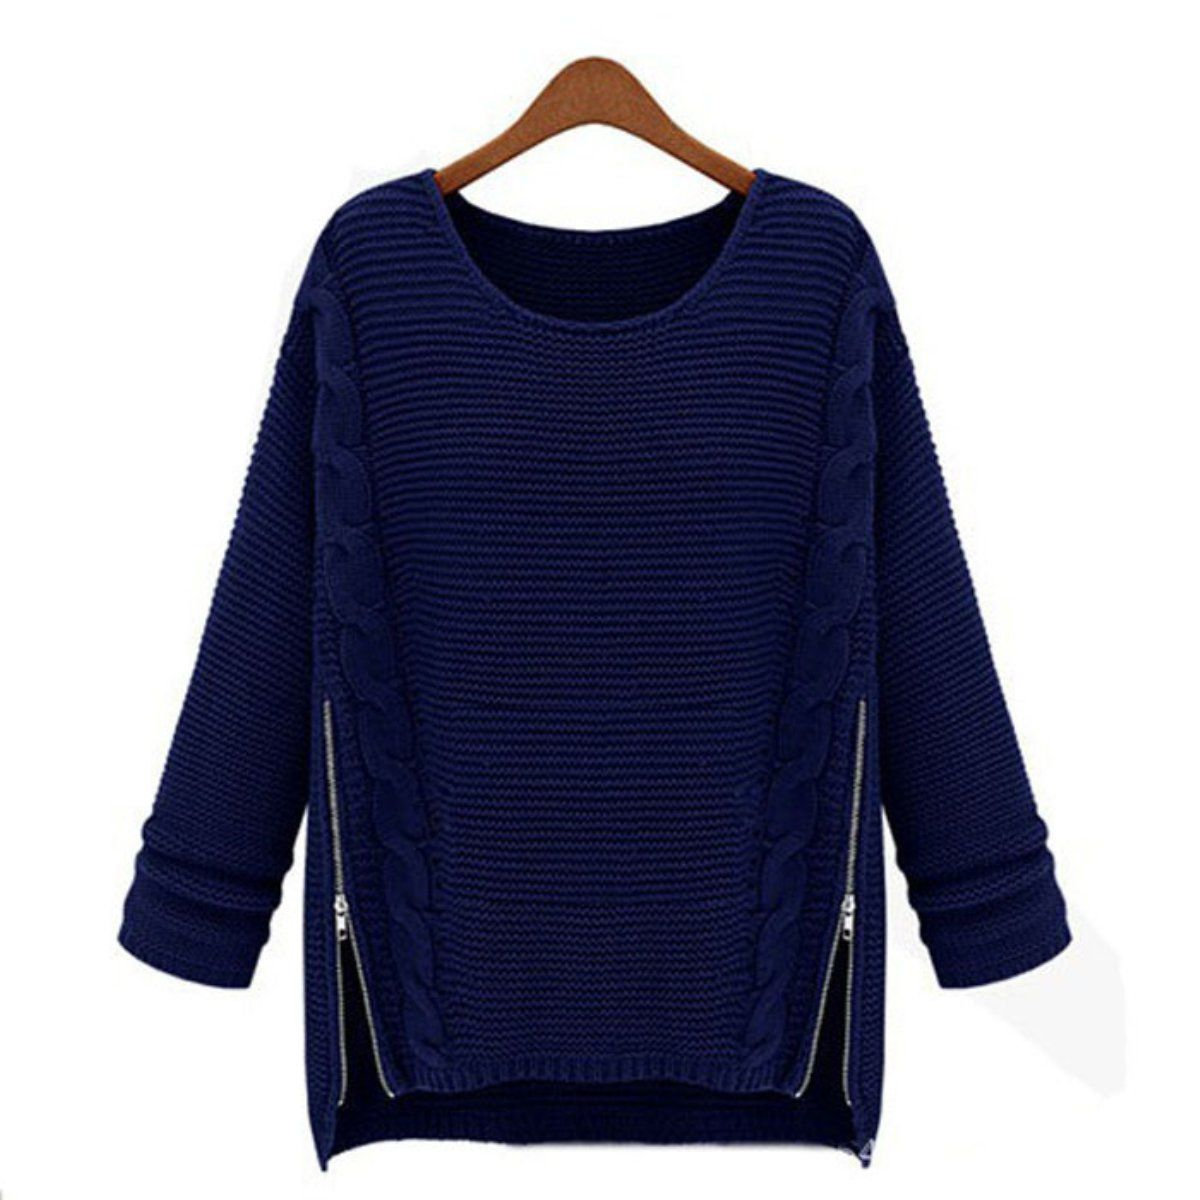 EKIMI Womens Knitted Loose O-Neck Sweater Zipper Knitwear Pullover ...